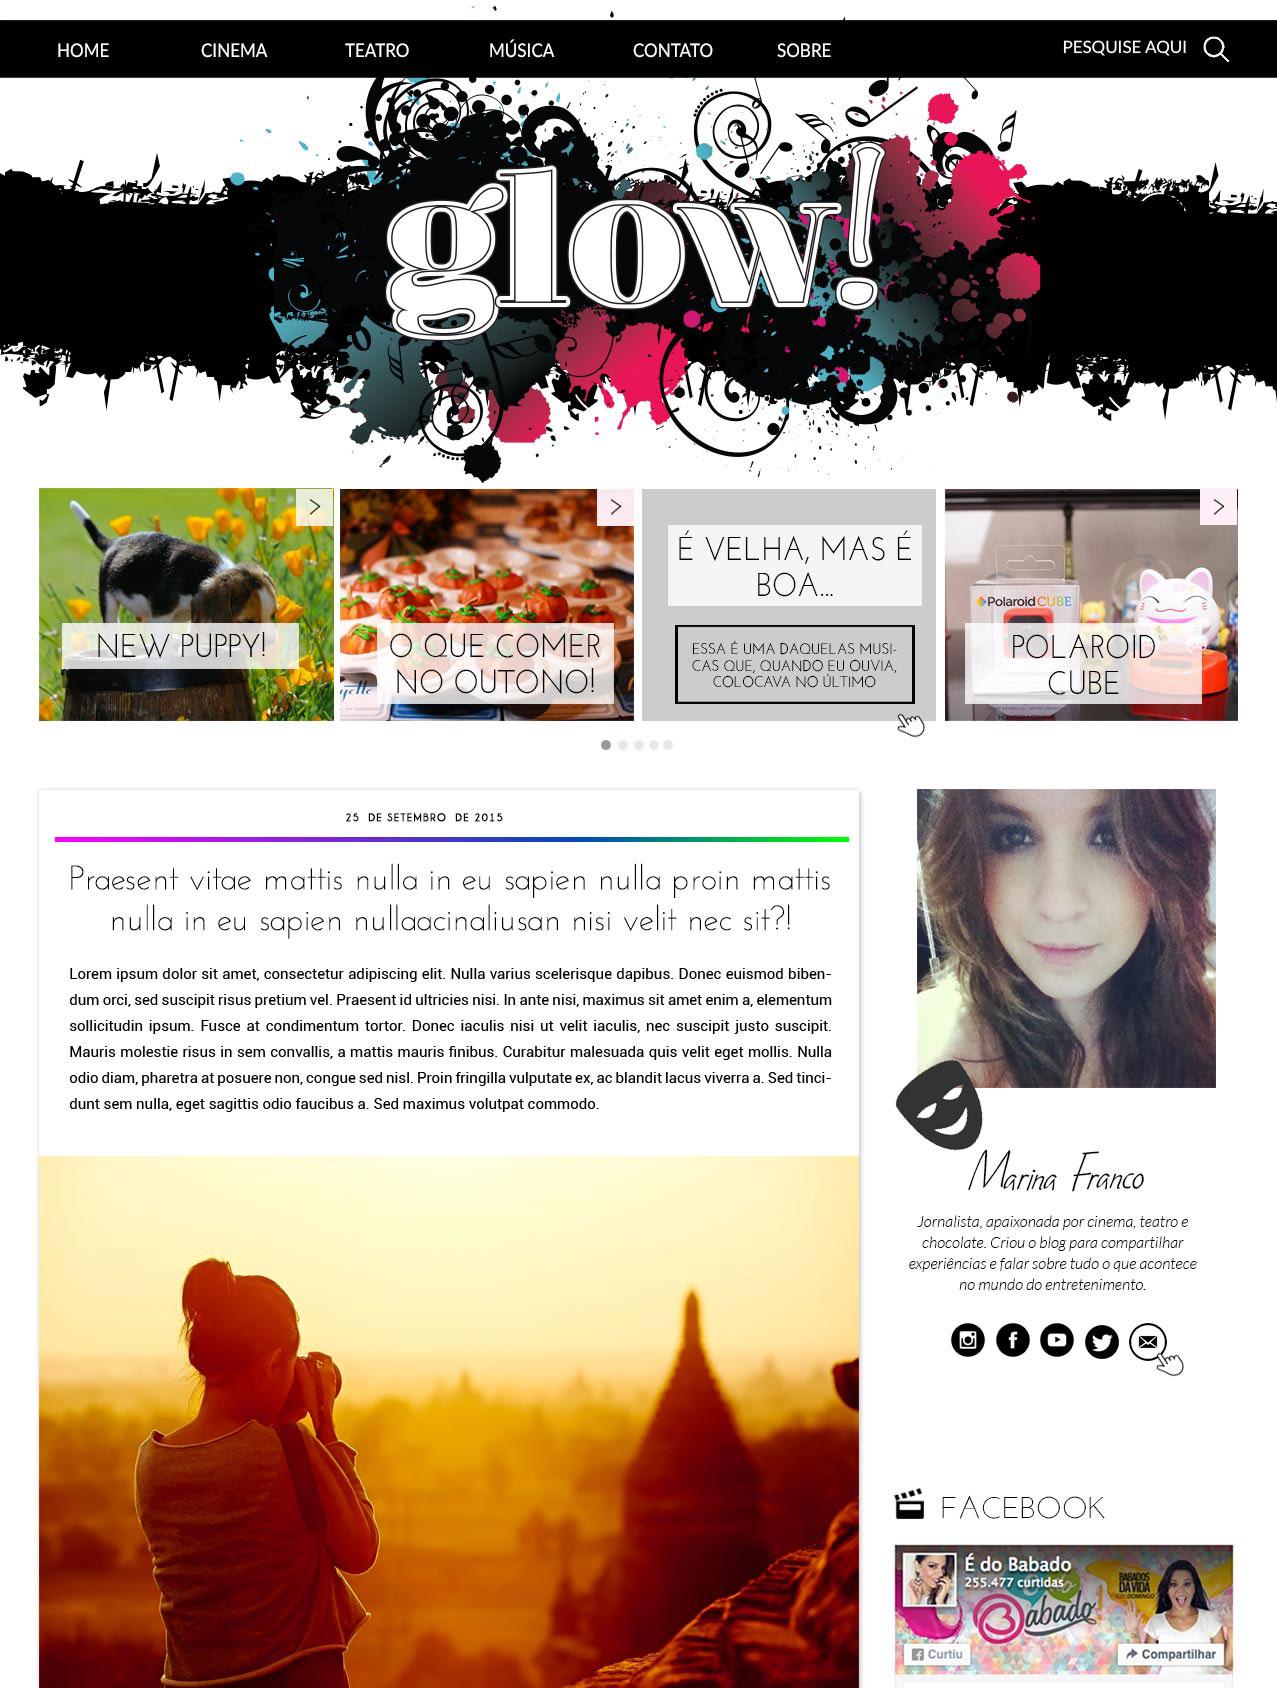 Glow!-MarinaFranco_V1